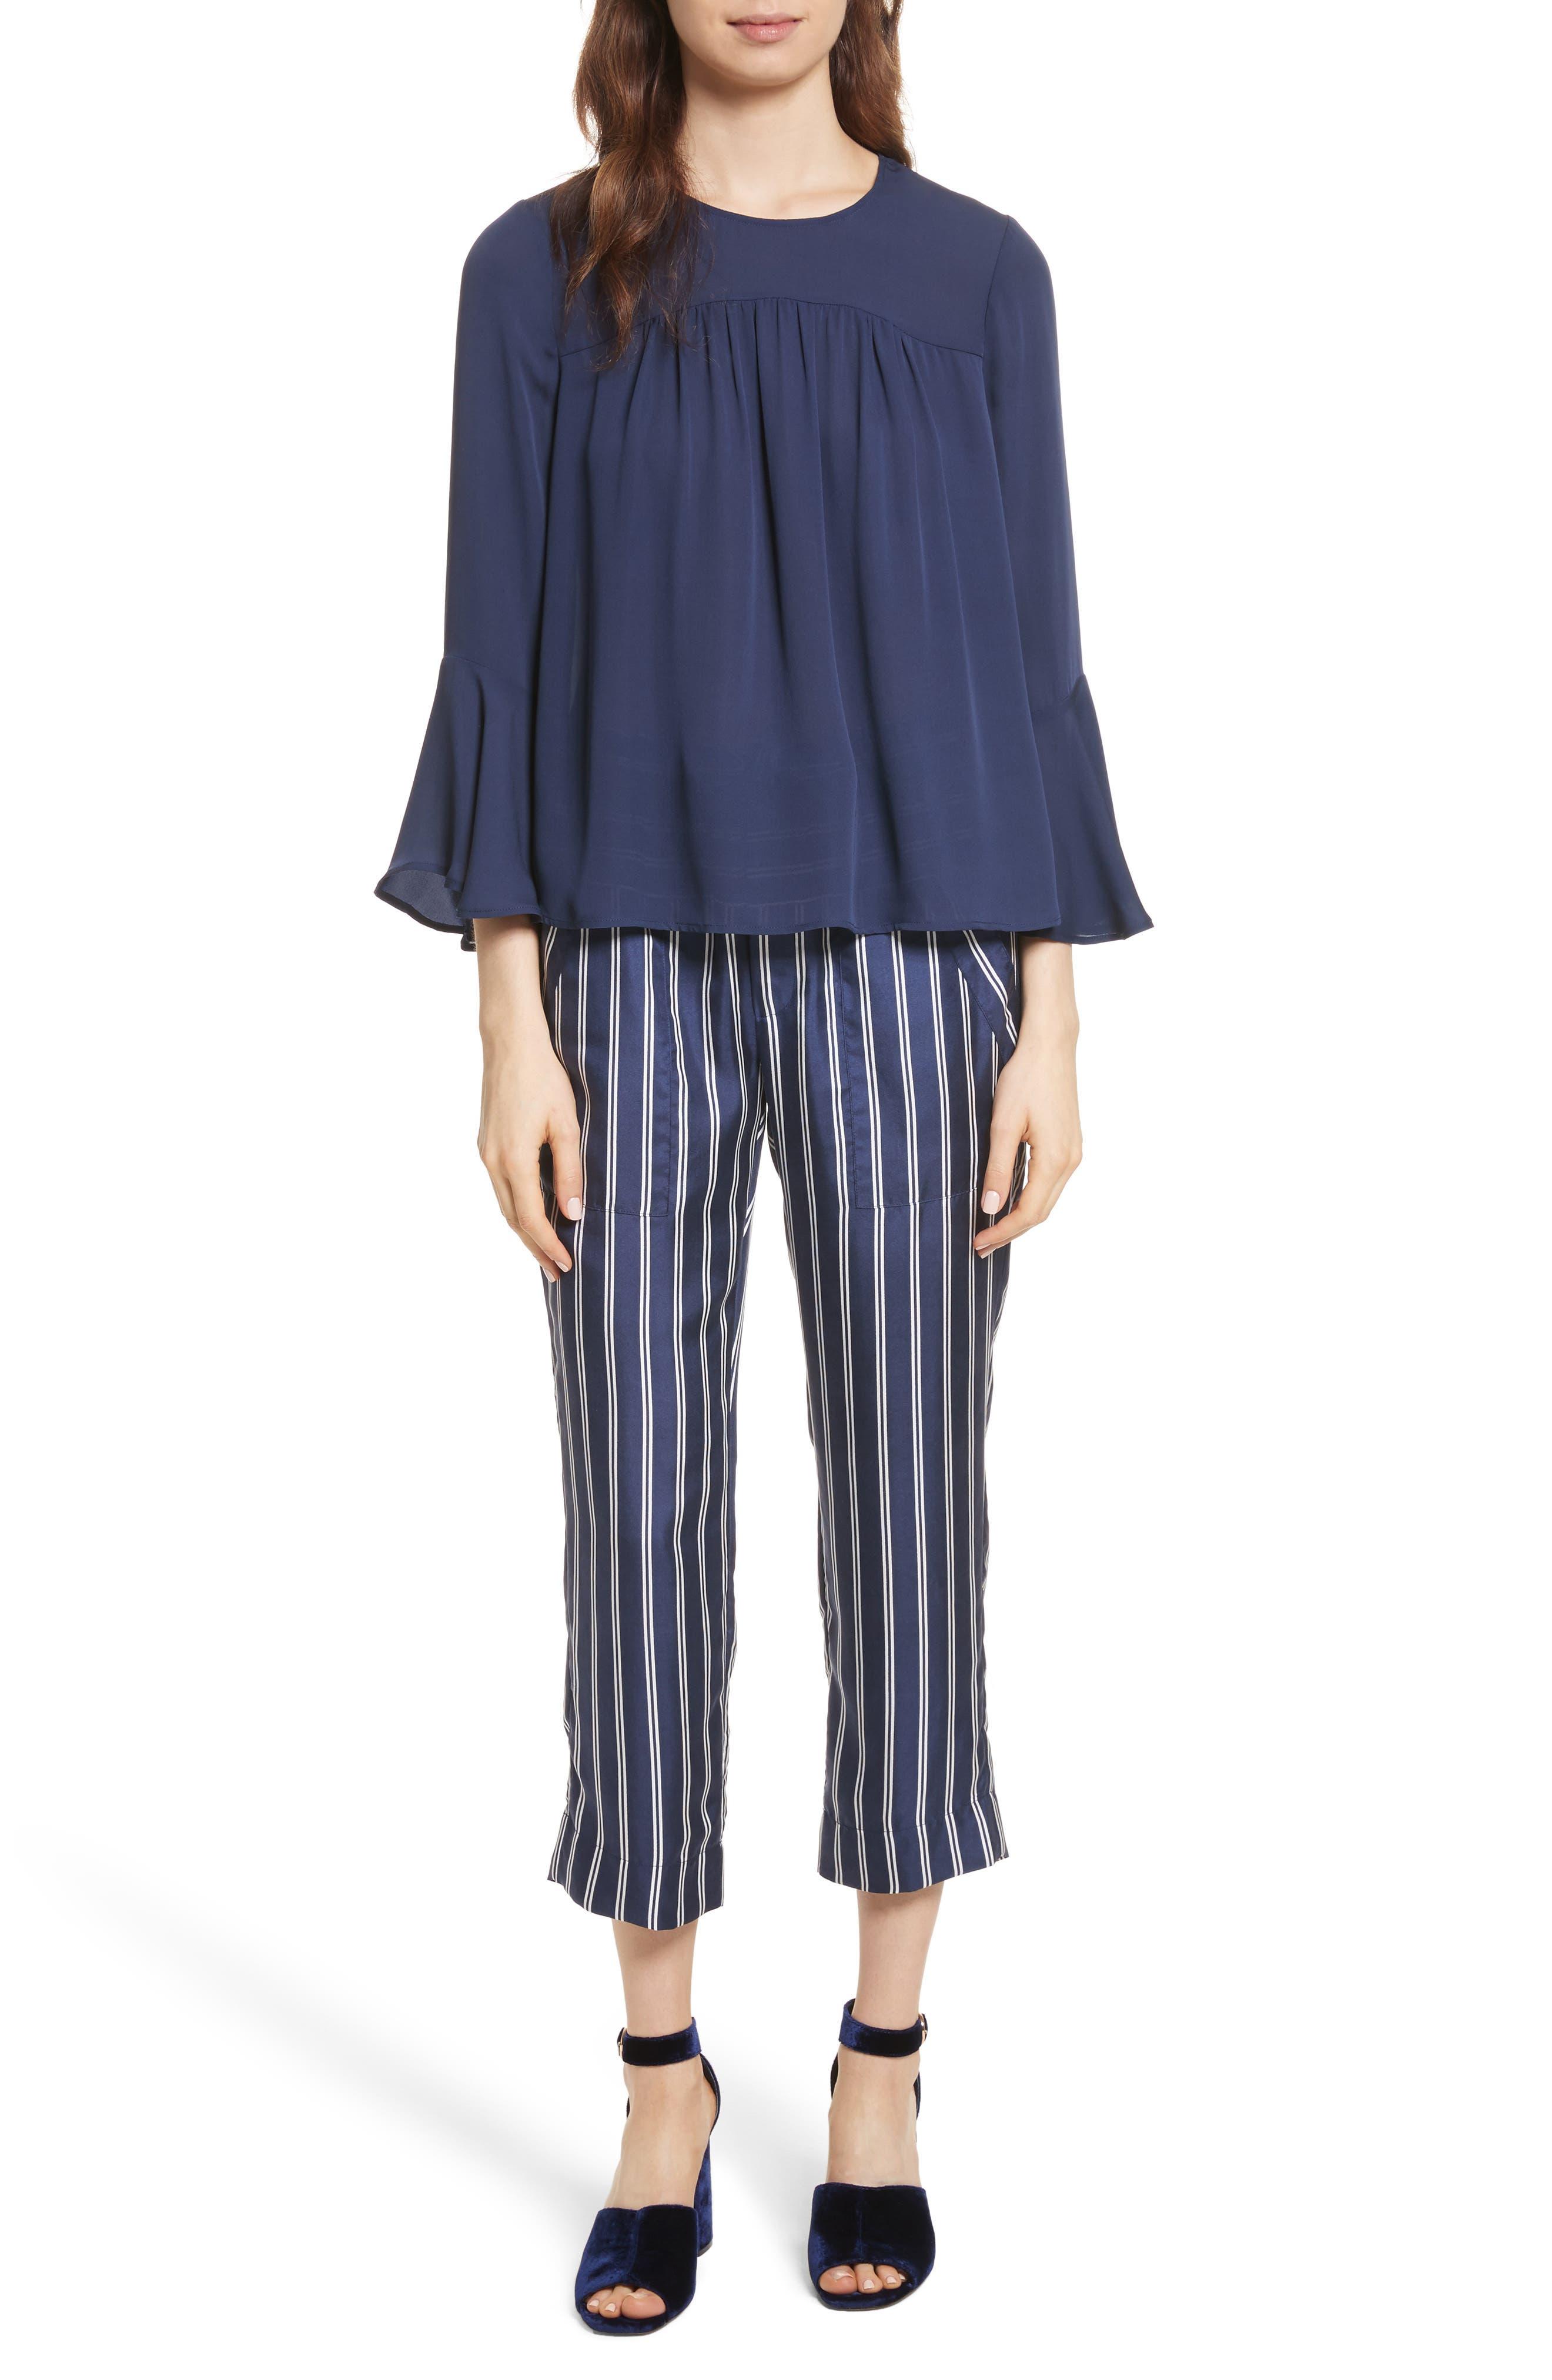 Addiena Stripe Silk Pants,                             Alternate thumbnail 8, color,                             Dark Navy